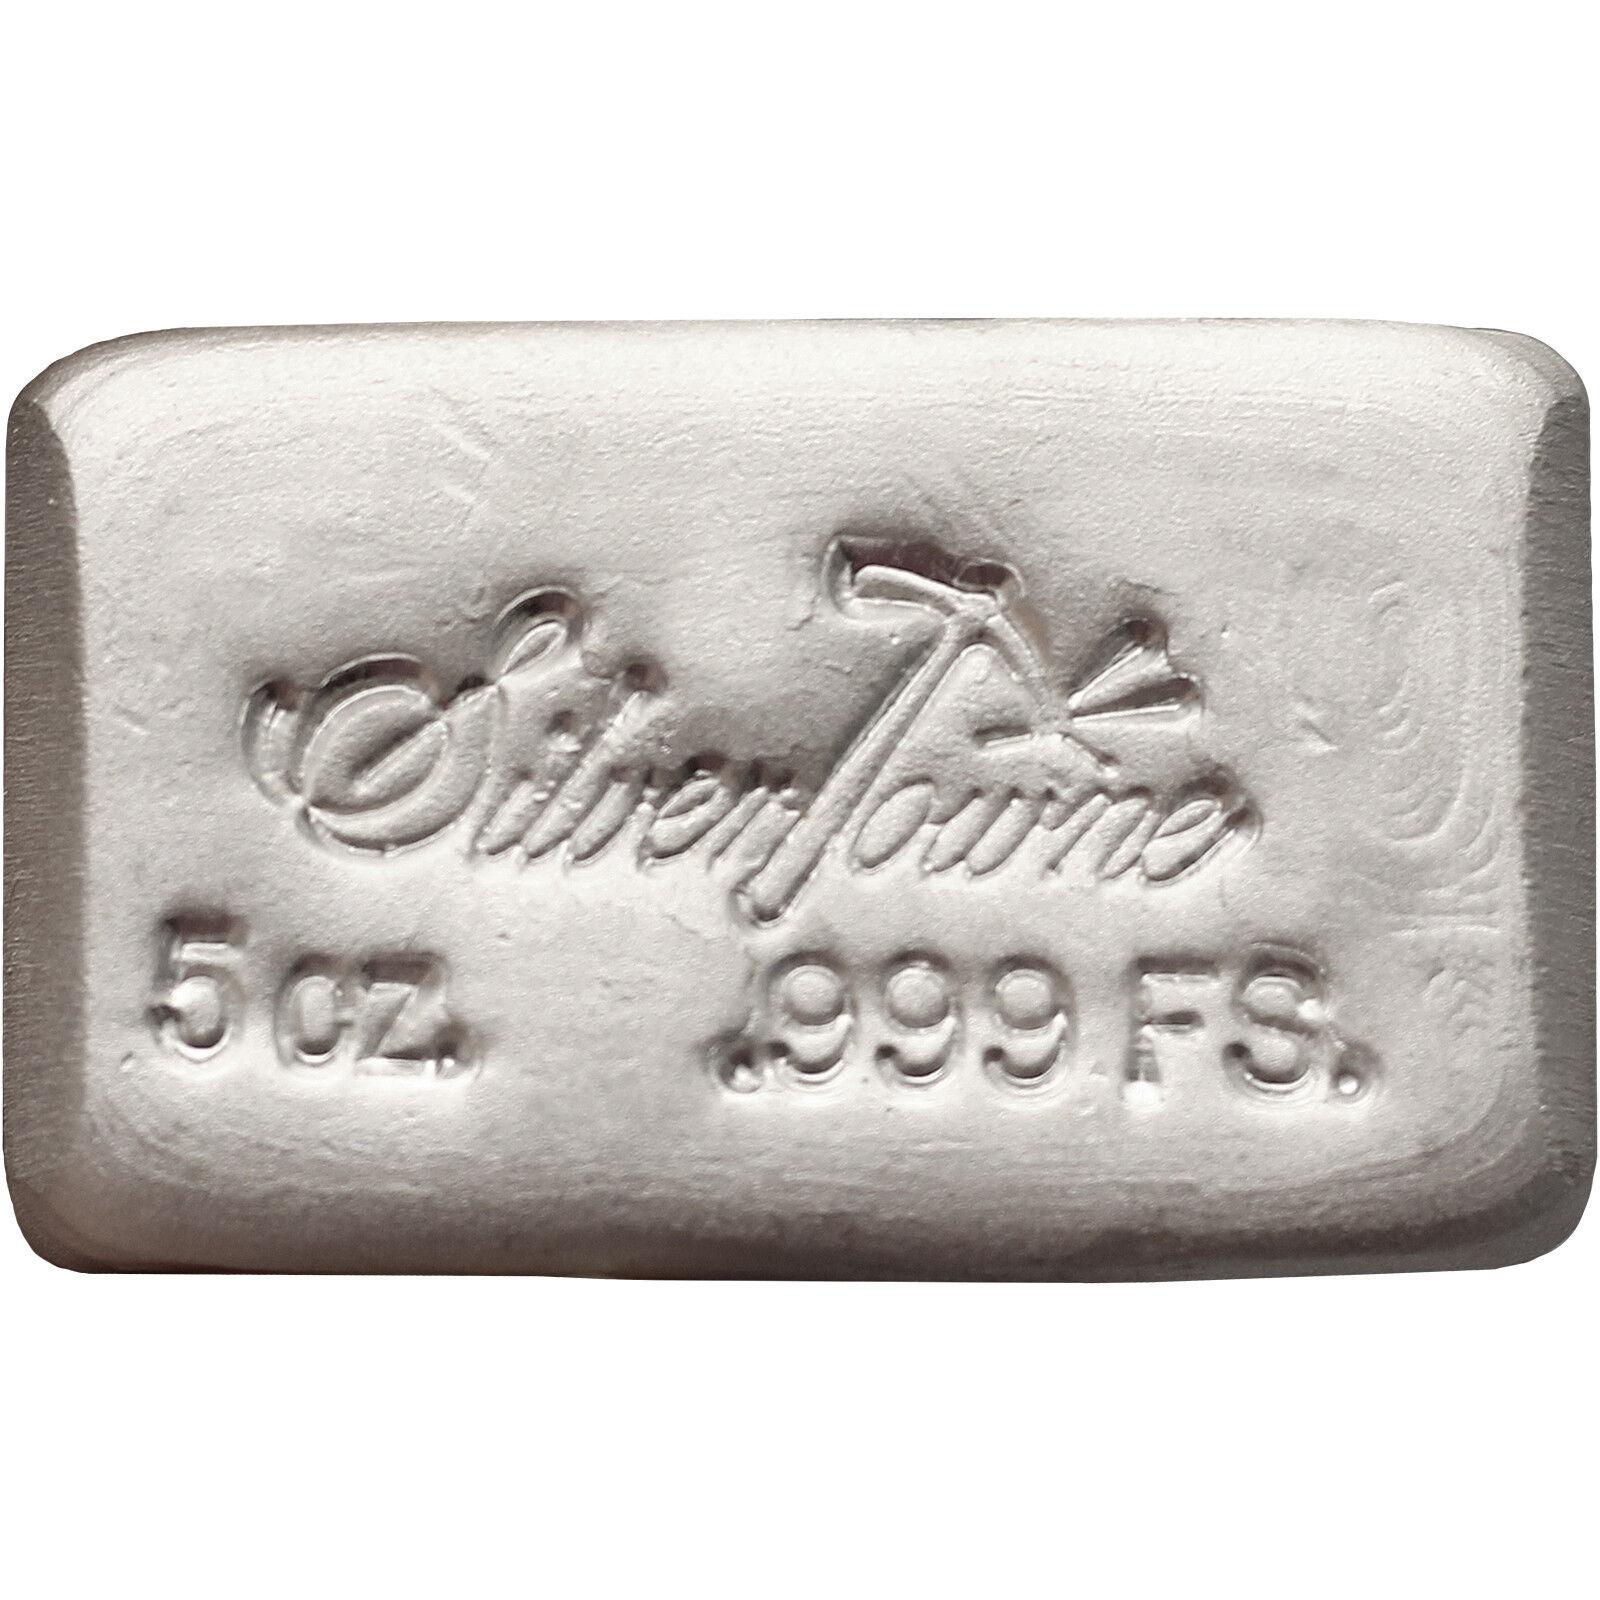 SilverTowne Hand-Poured 5oz .999 Fine Silver Bar